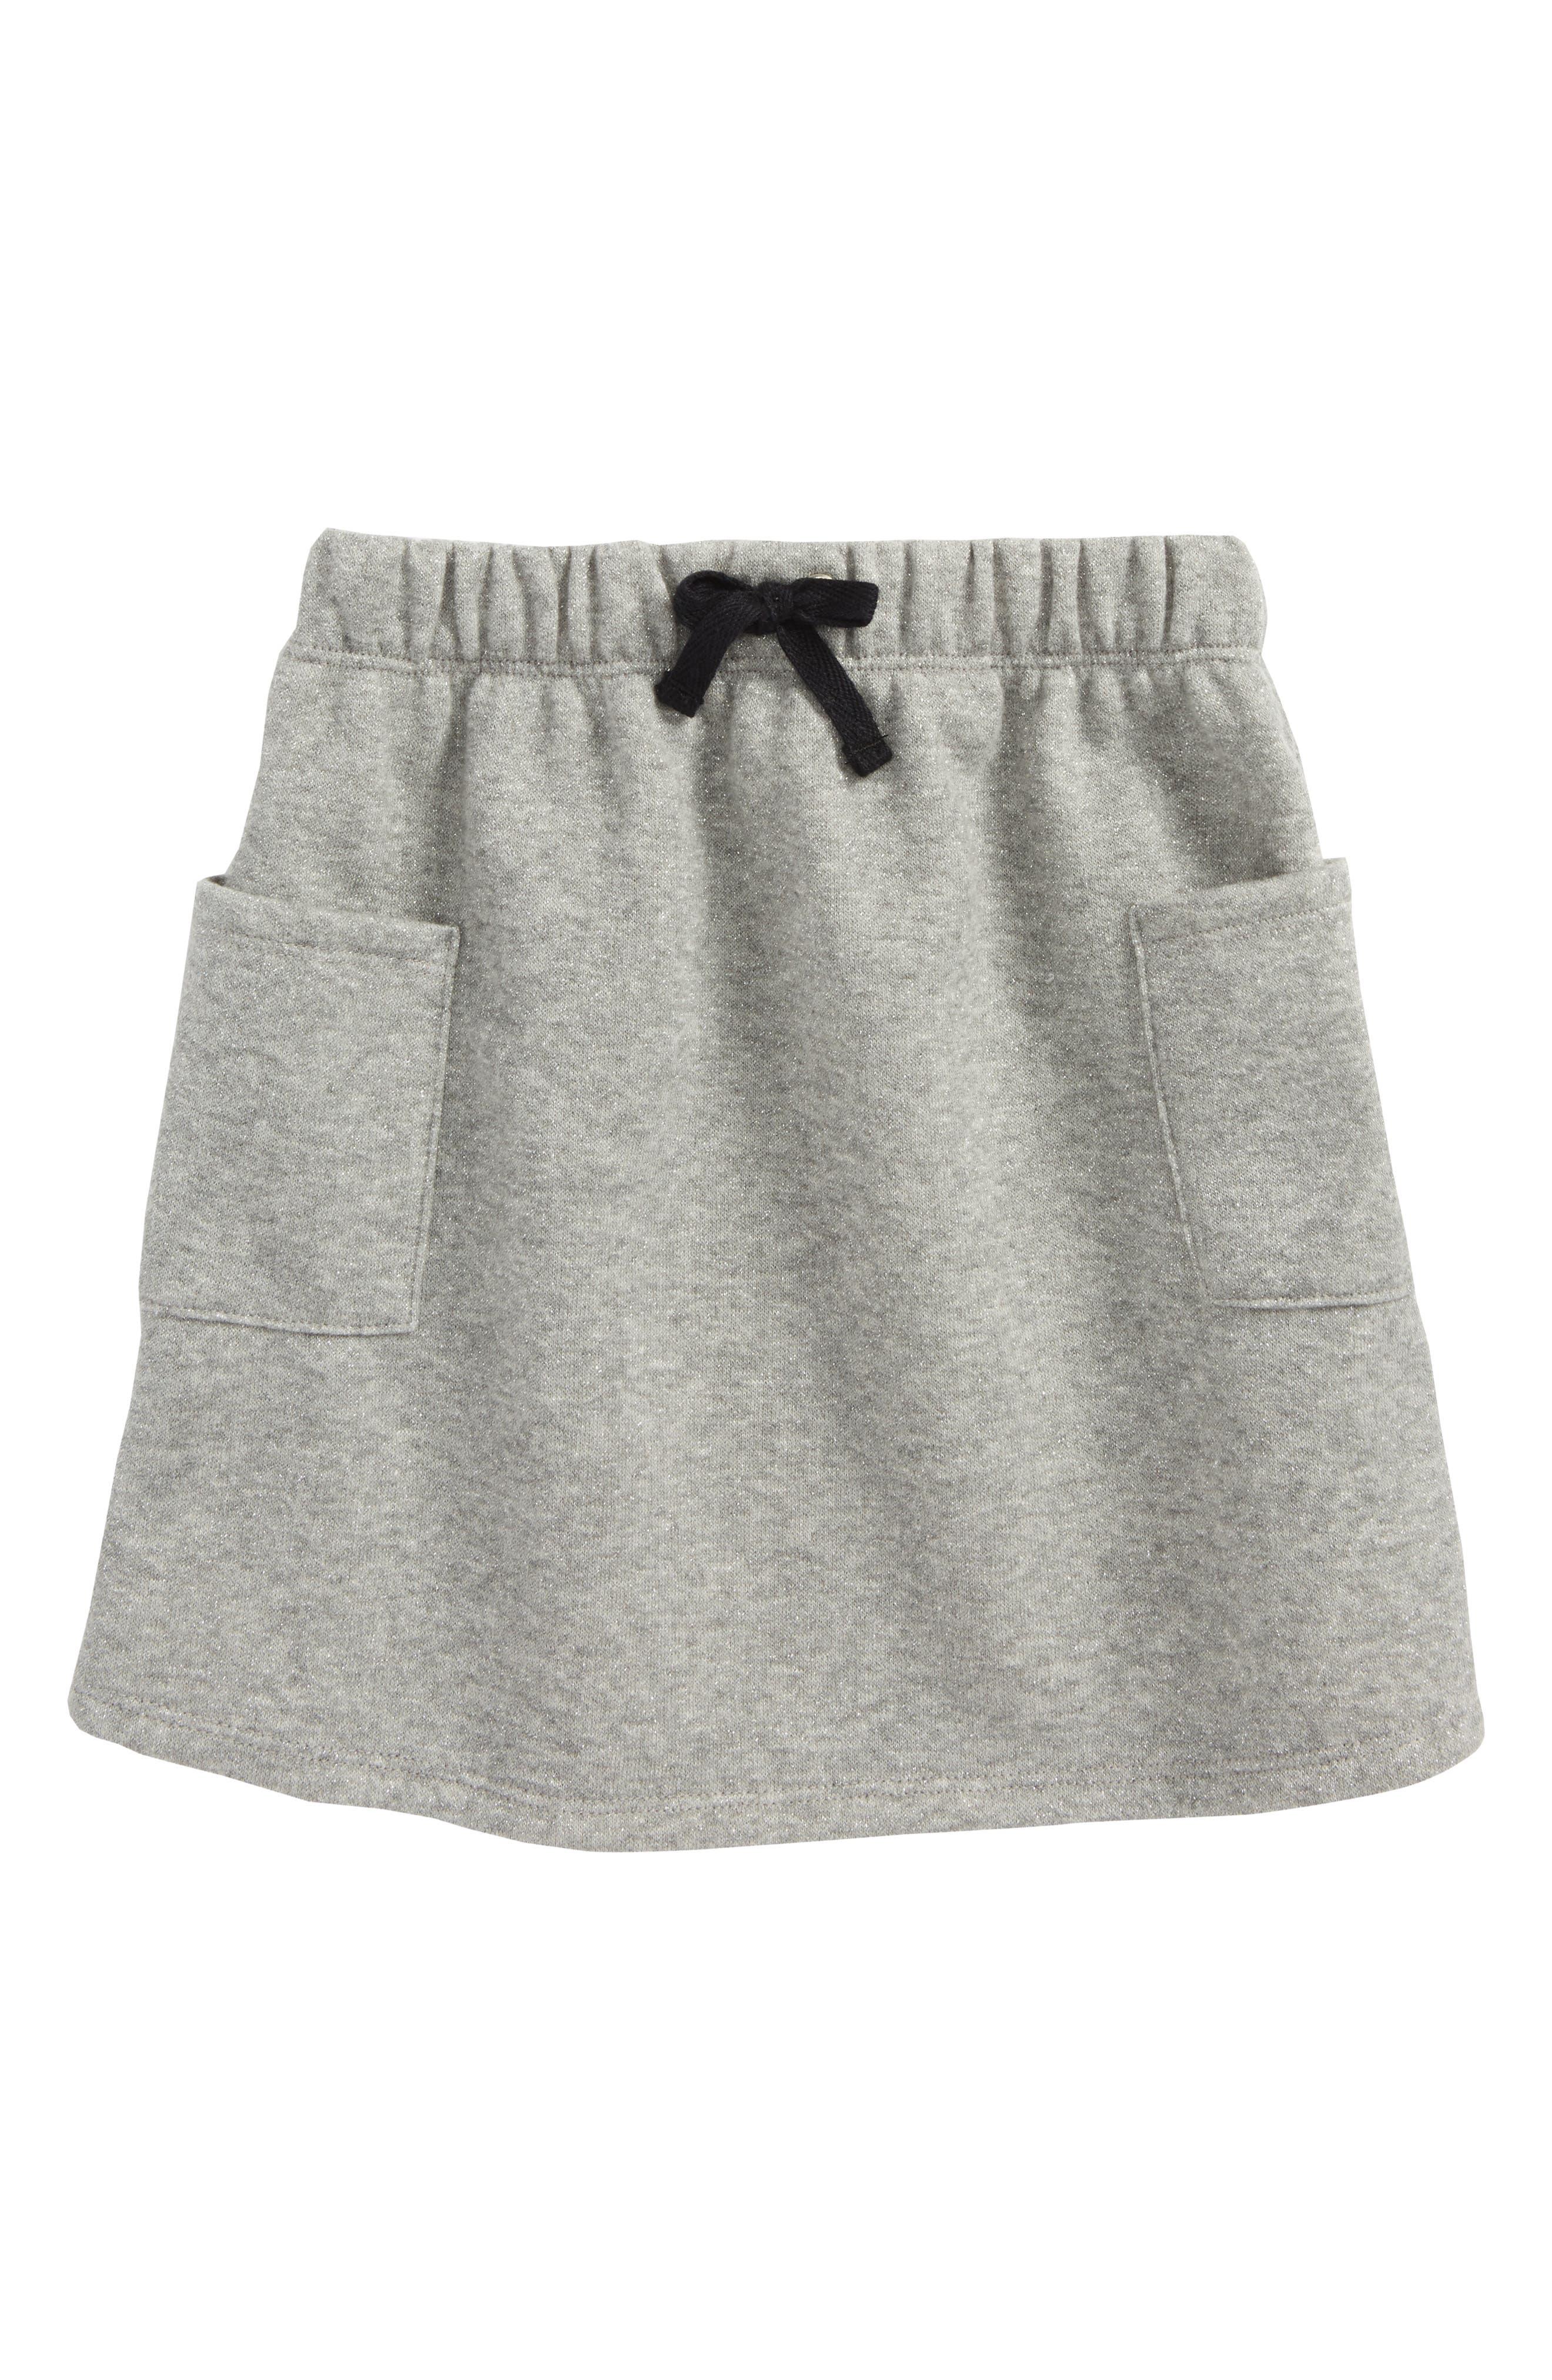 Main Image - Tucker + Tate Sparkle Terry Skirt (Toddler Girls, Little Girls & Big Girls)